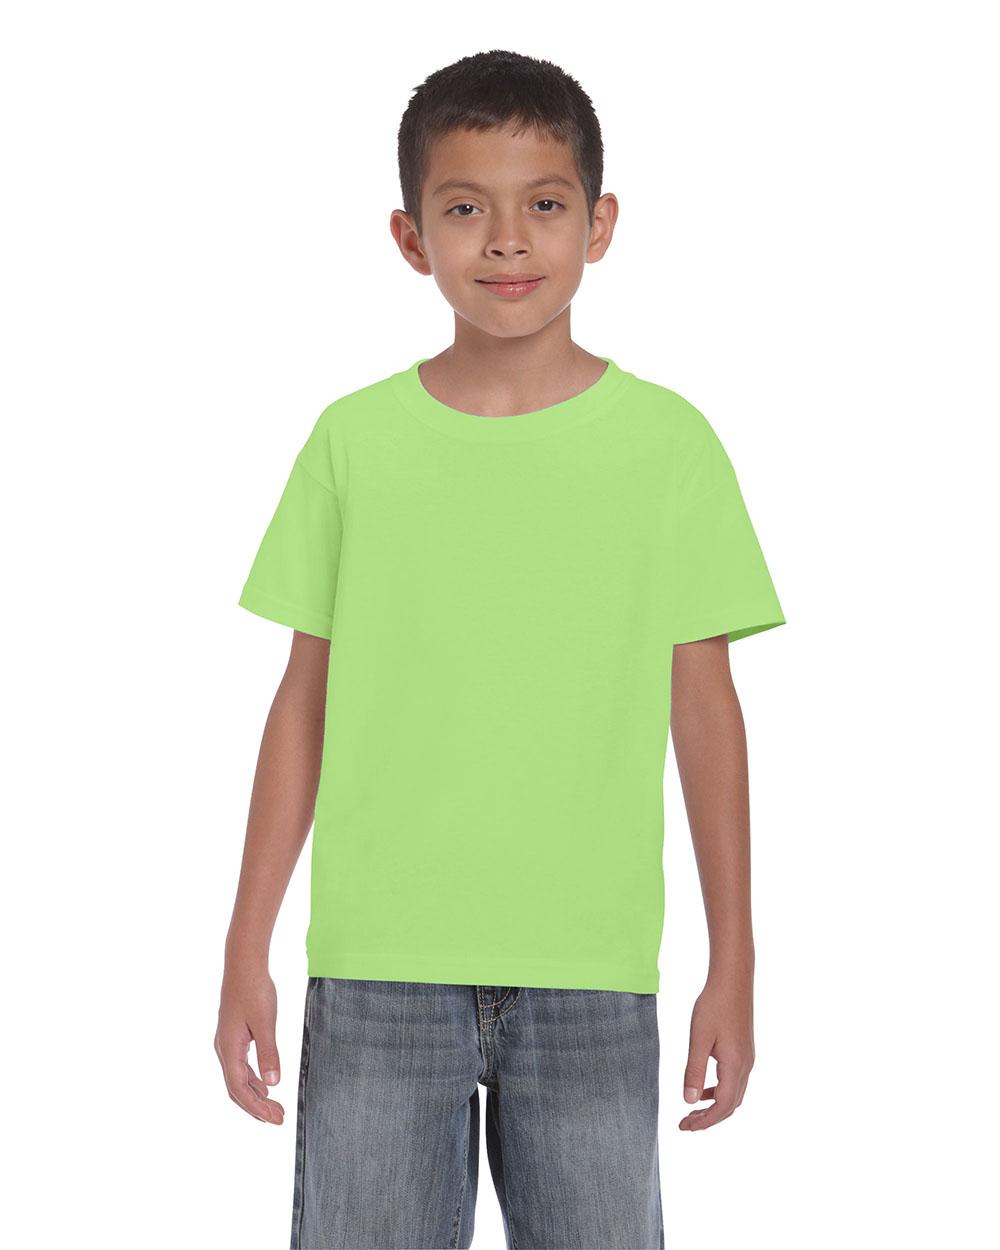 Gildan 2000B       Ultra Cotton™    Classic Fit Youth T-Shirt    6.0 oz. 100% Cotton